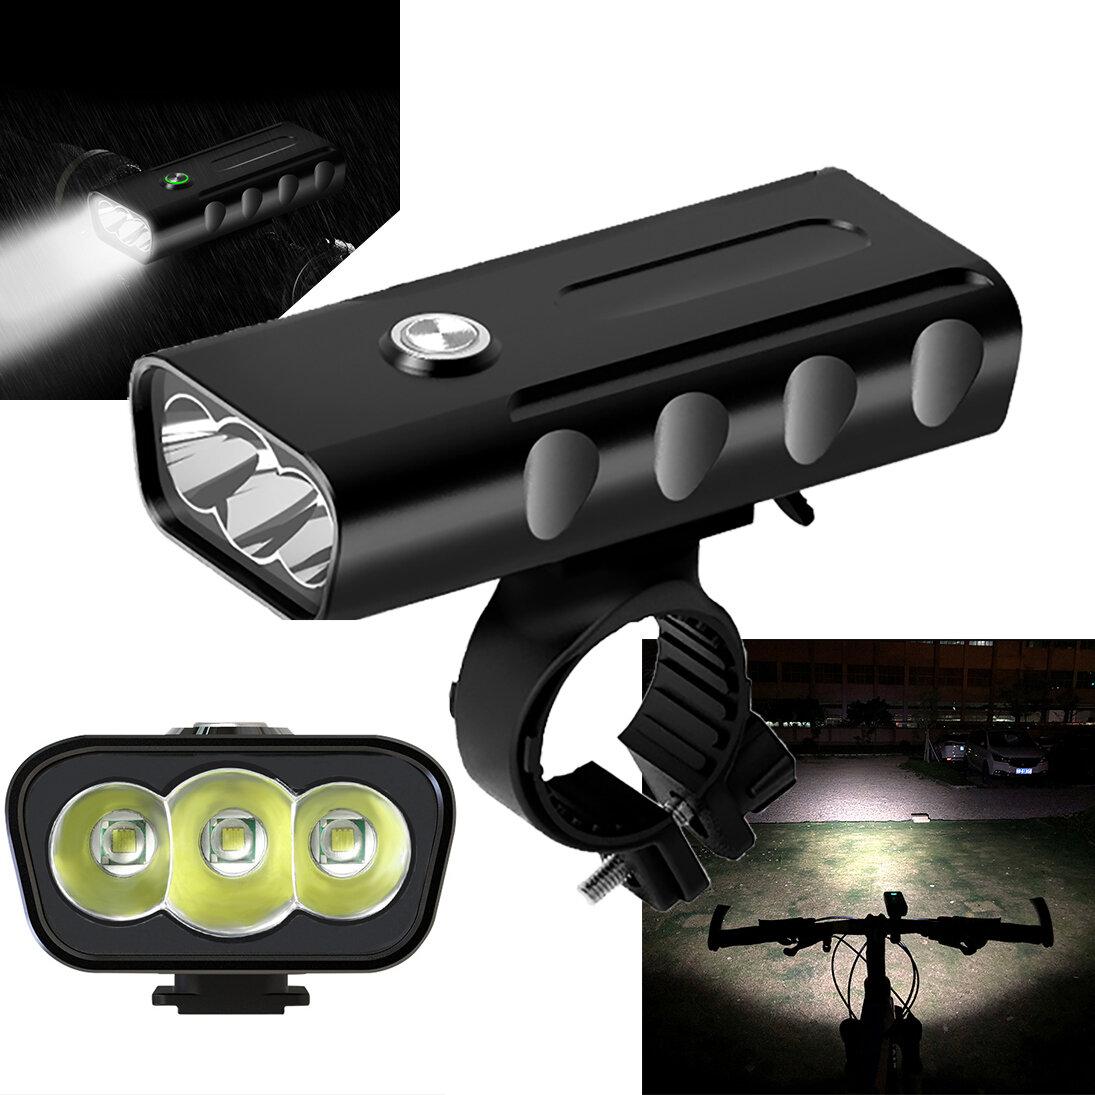 XANES XL29 Light 18650mAh Батарея USB мотоцикл E-bike Bike Велосипедный фонарик